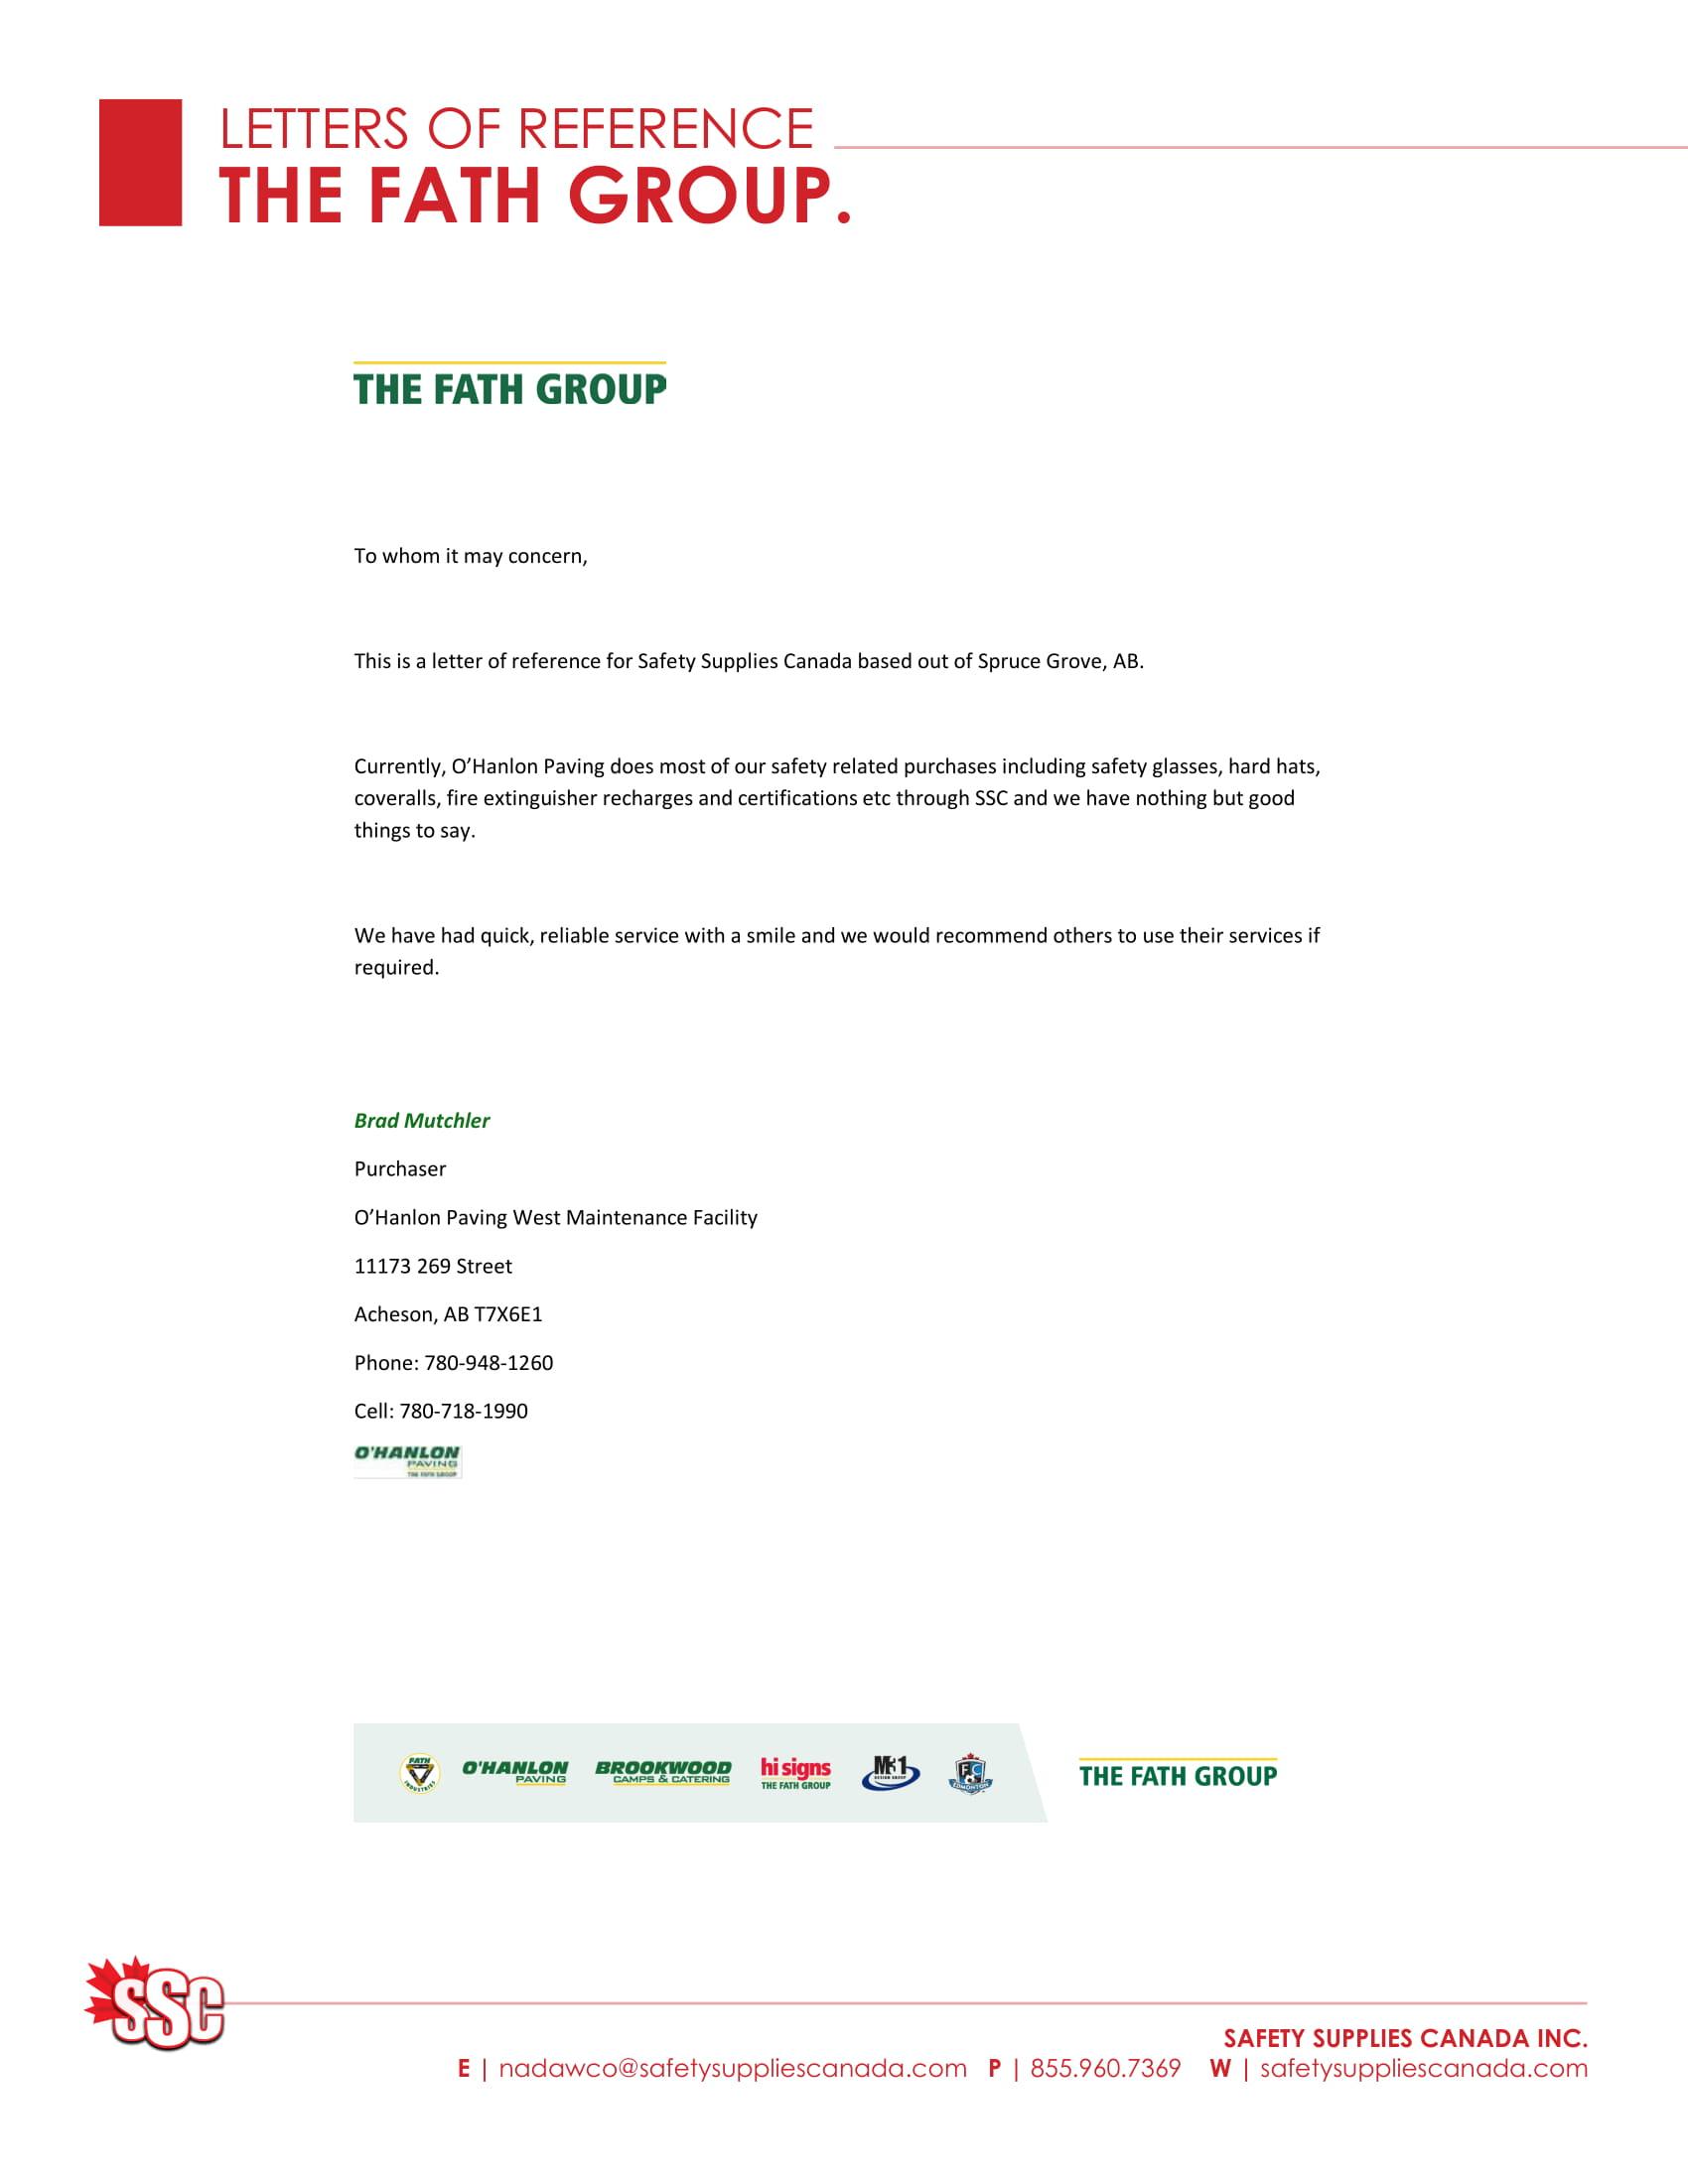 ssc-company-profile-09.29.18-web-6.jpg